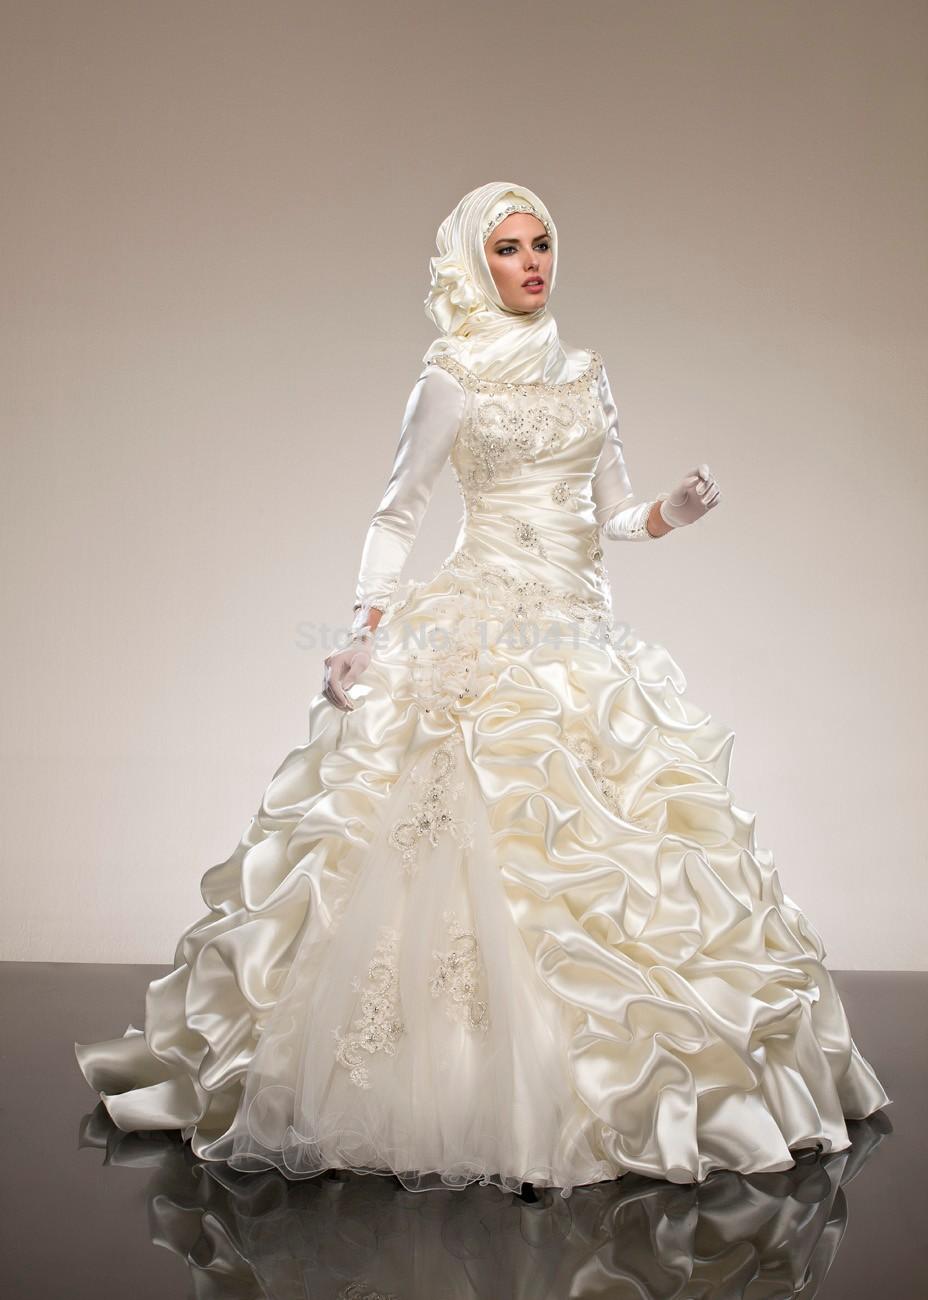 Sequins Appliques Ball Gown Muslim Wedding Dress With Hijab muslim wedding dresses Muslim Wedding Dress with Hijab See Larger imageSee